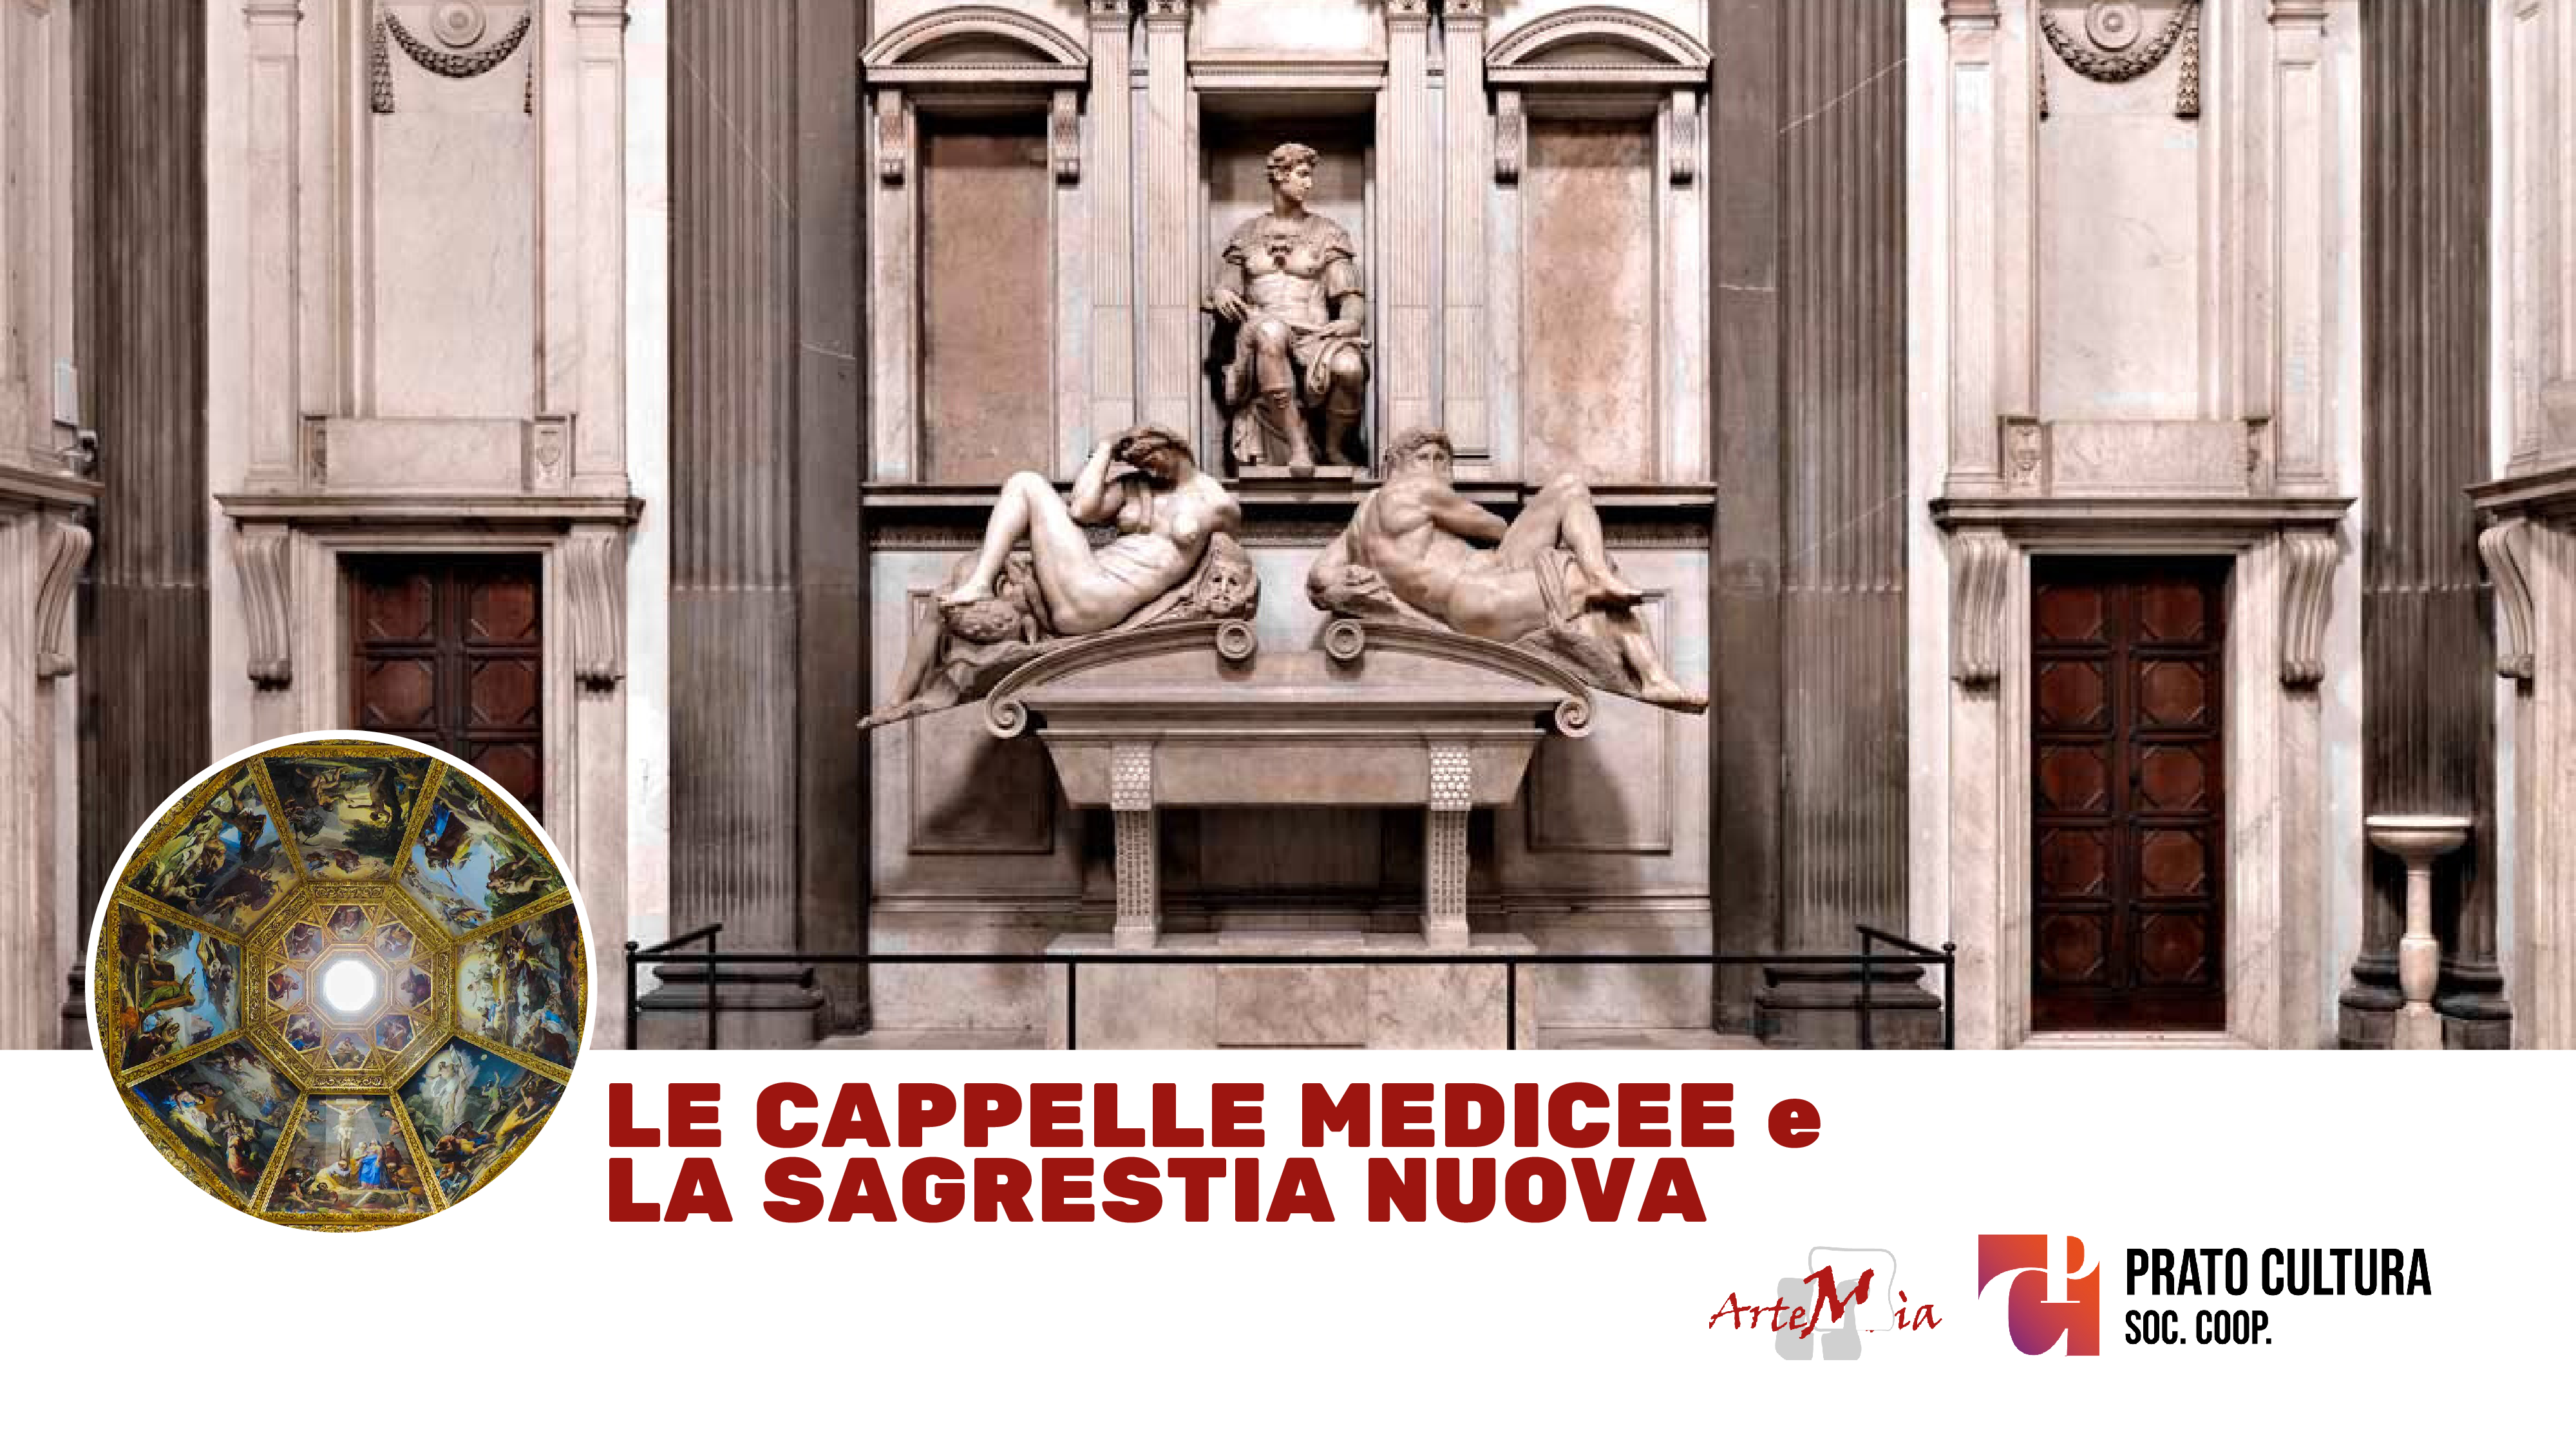 Le Cappelle Medicee in San Lorenzo a Firenze